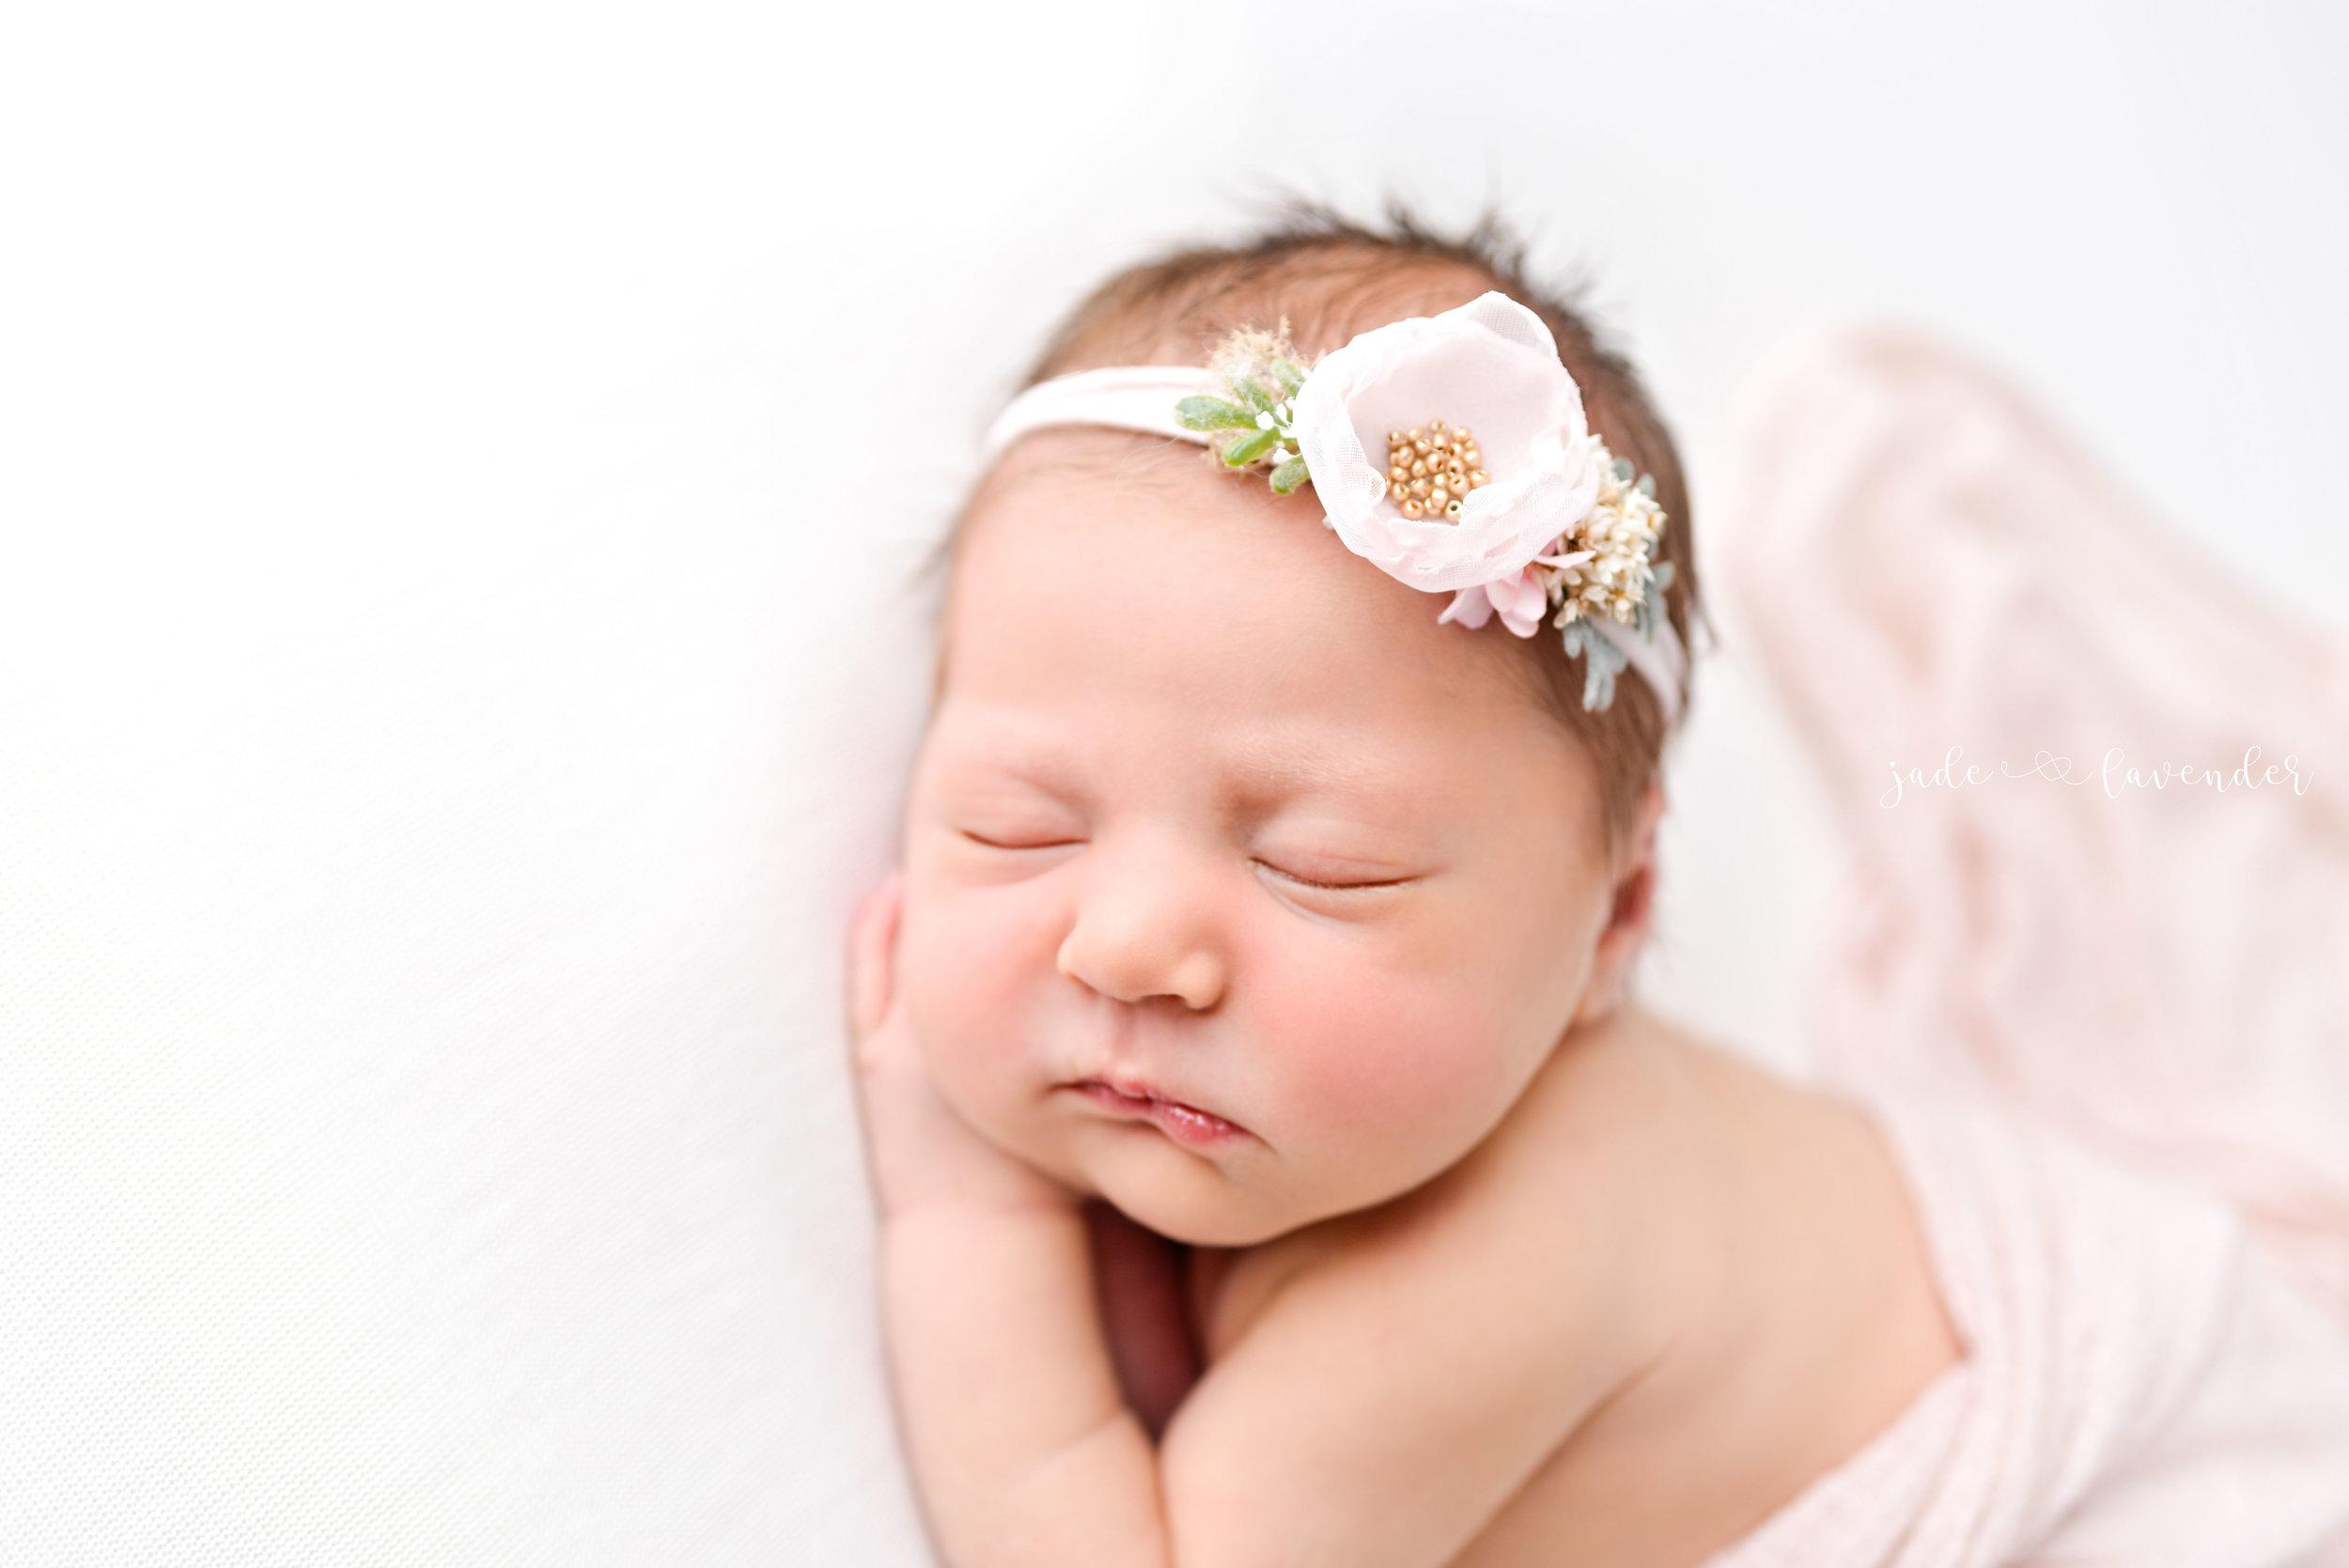 Baby-girl-pink-newborn-photography-infant-images-baby-photos-photographer-spokane-washington (3 of 8).jpg